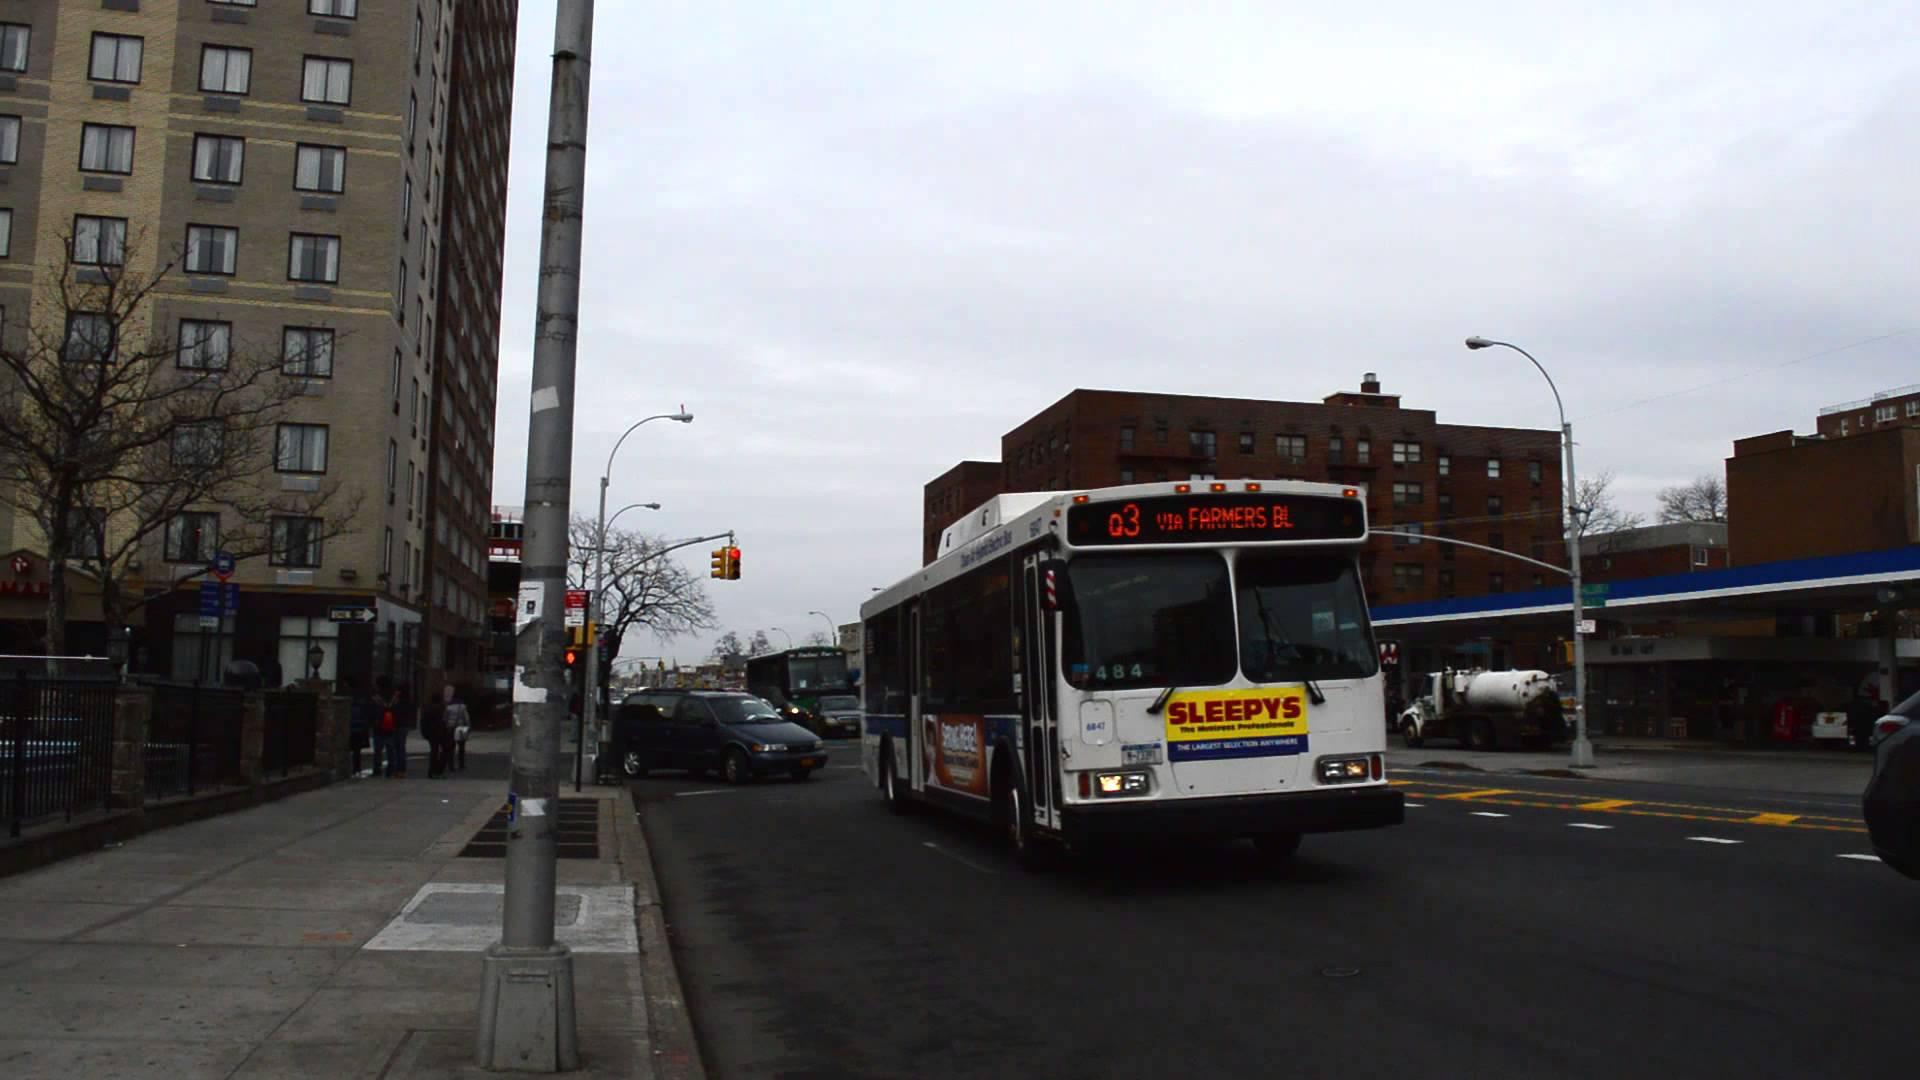 Bus Q3 de l'aéroport JFK vers le Queens